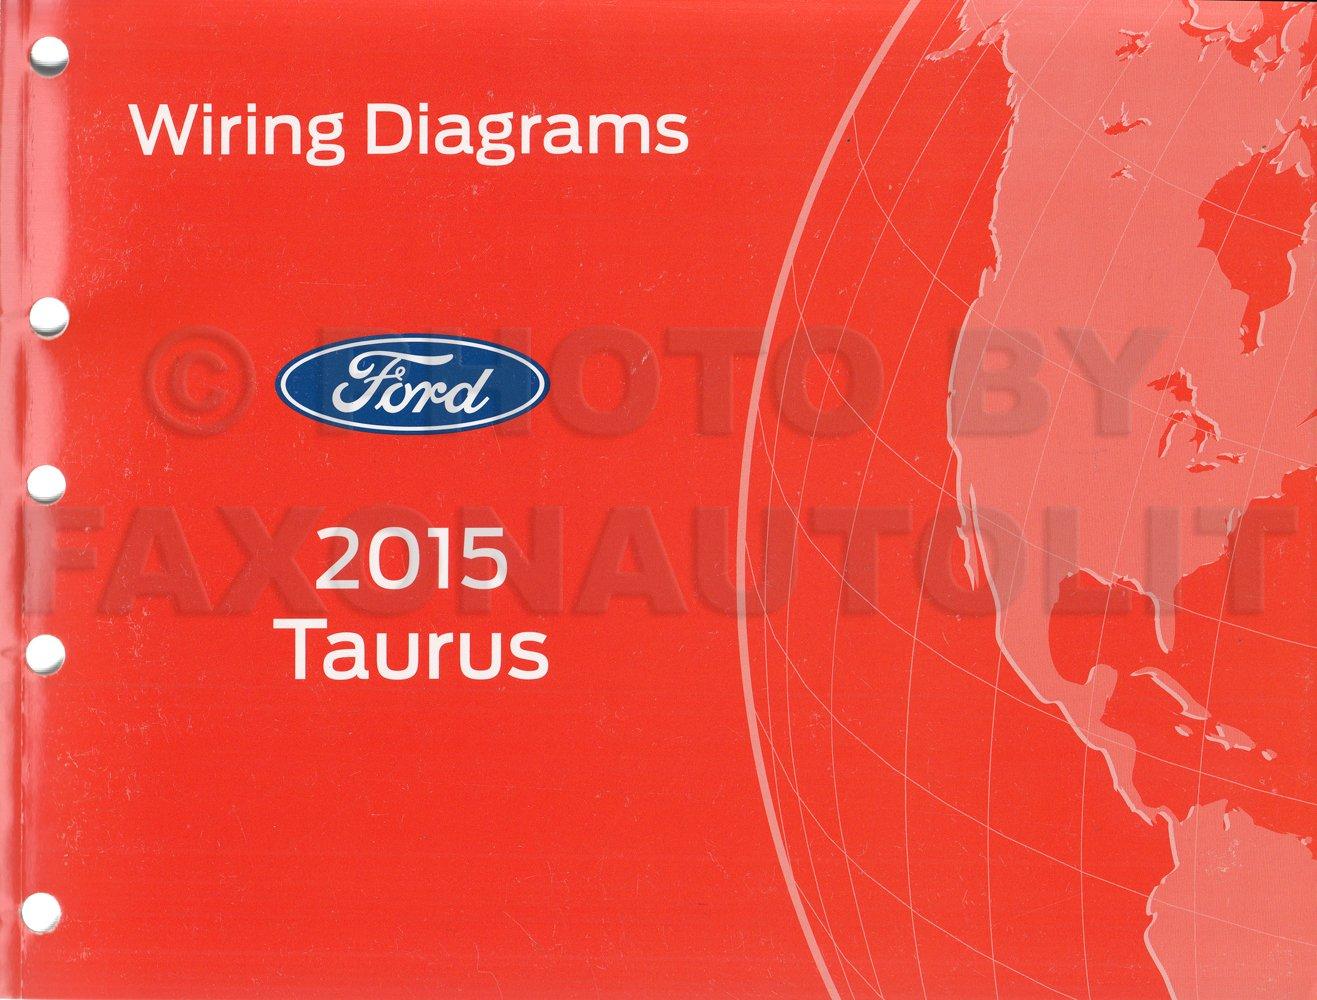 Ford Tauru Wiring